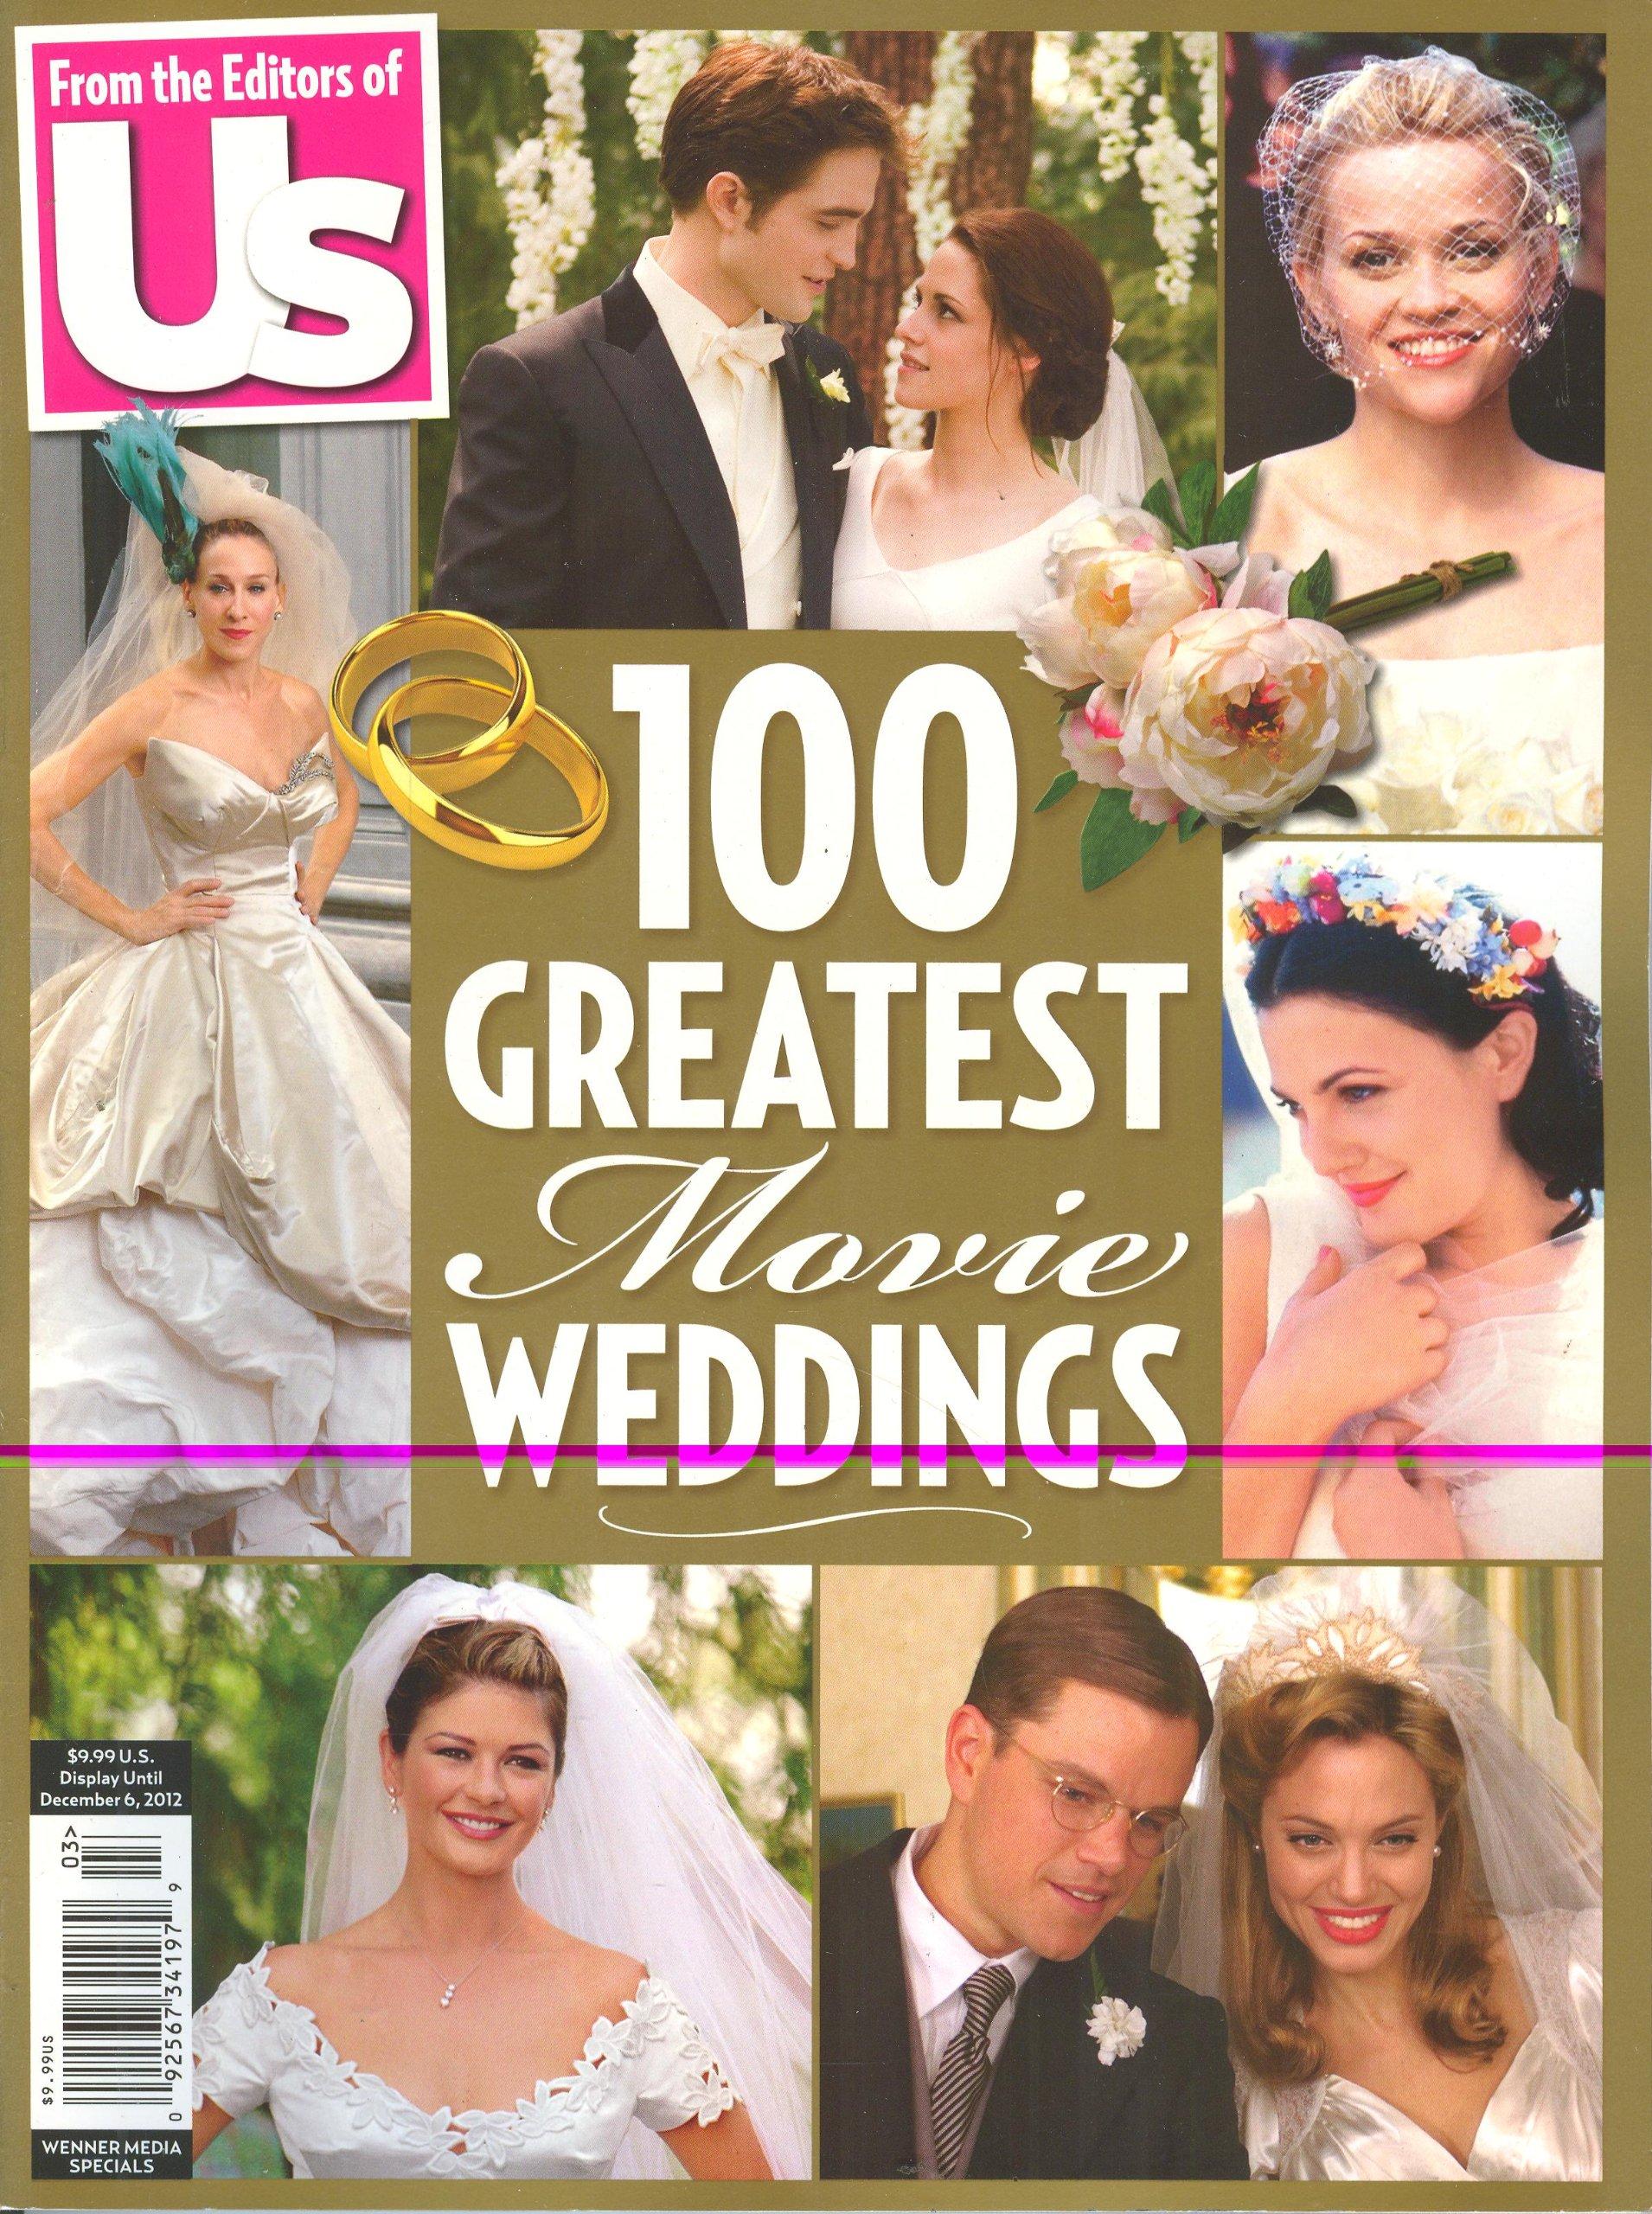 100 Greatest Movie Weddings (Us Magazine Collectors Edition,2012) pdf